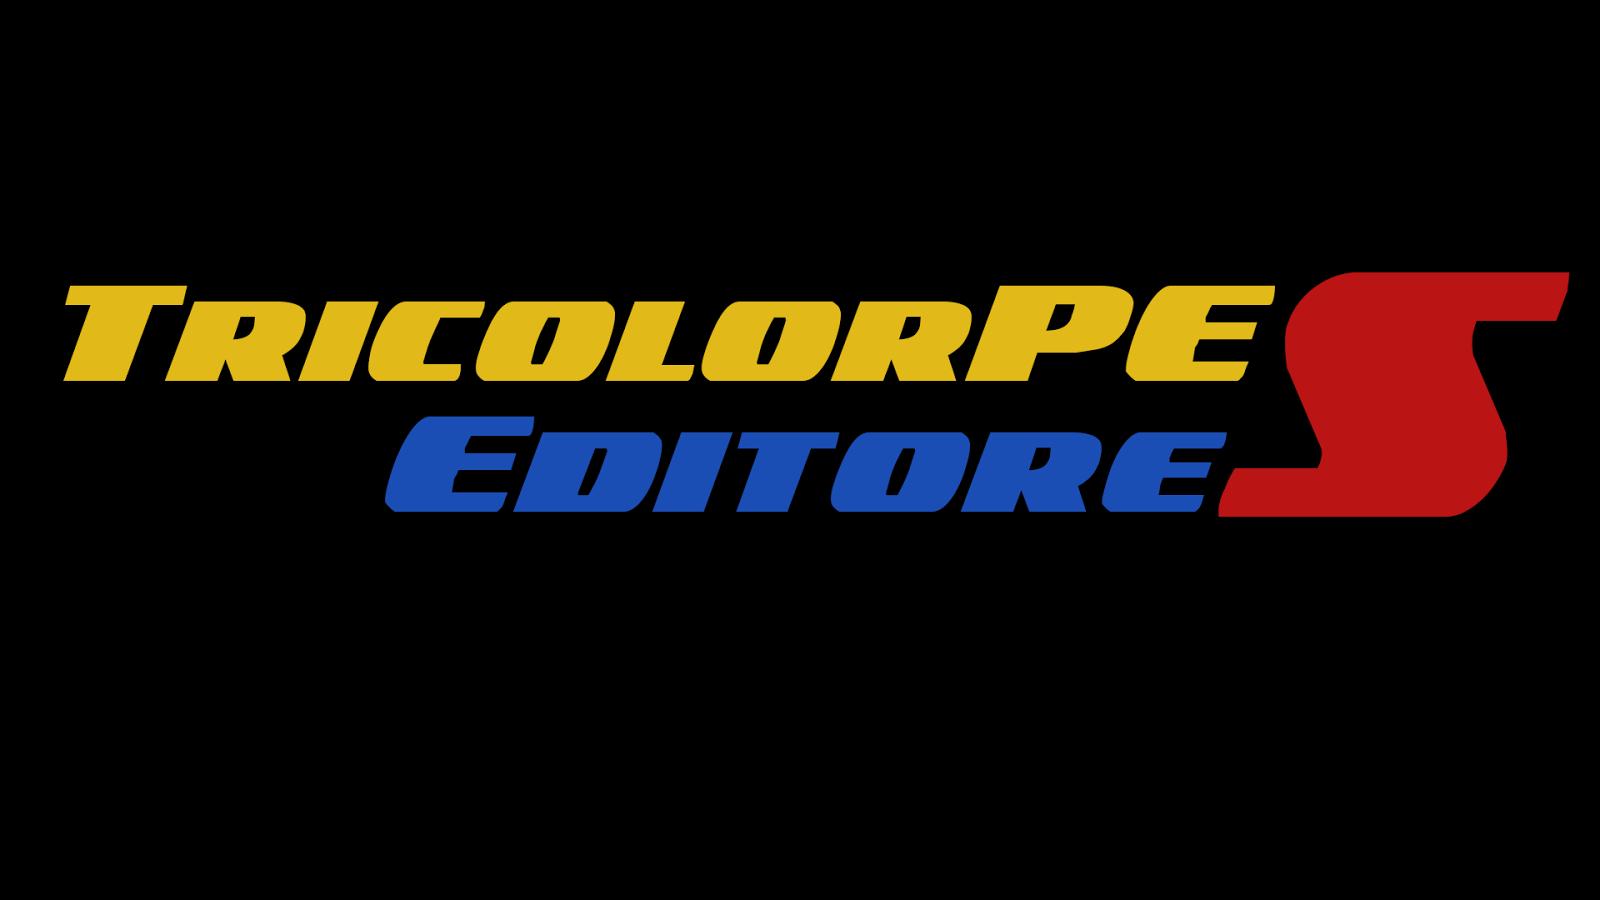 TricolorPES Editores